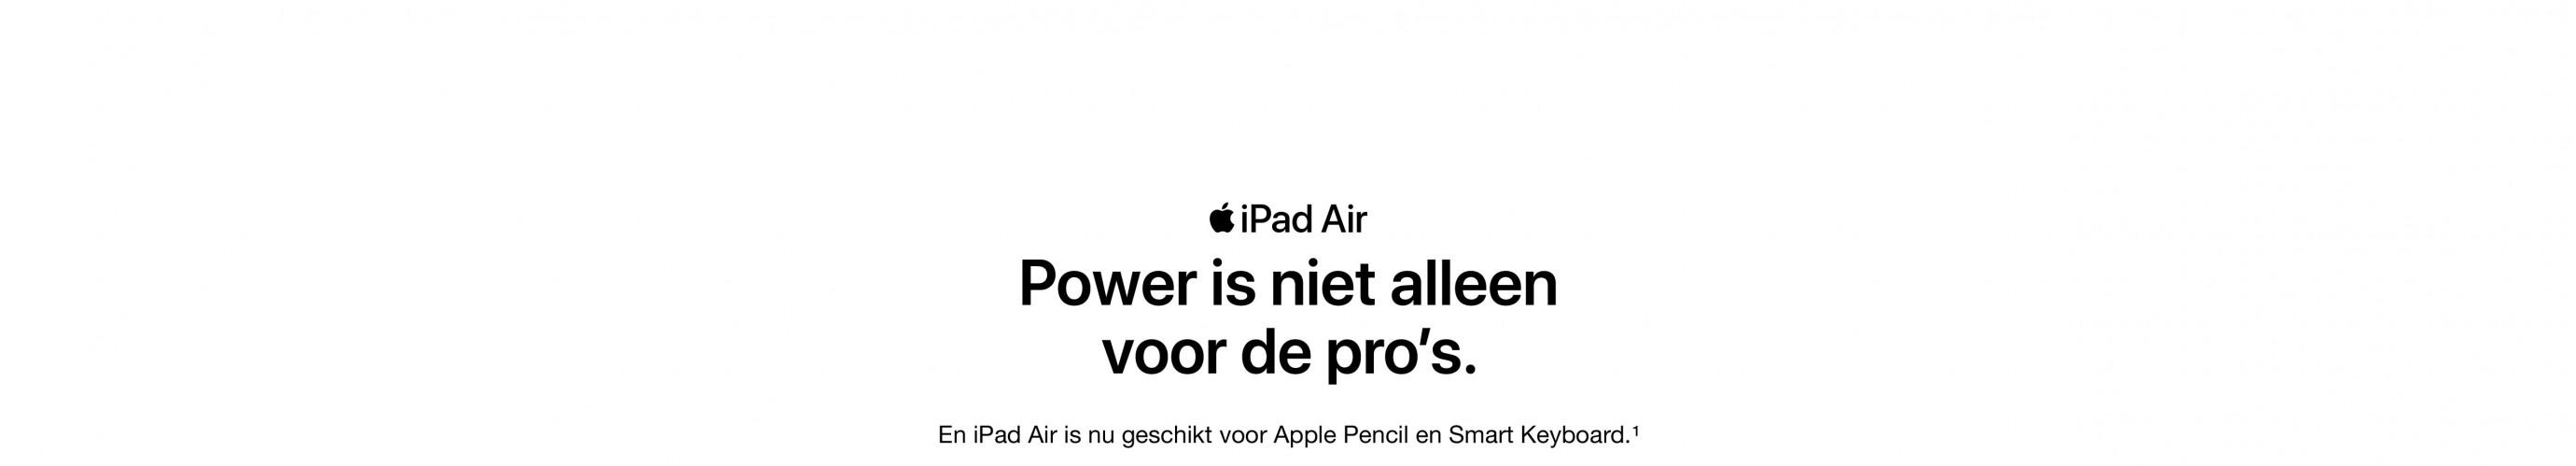 Productpage---iPad-Air-2019-nl_01.jpg